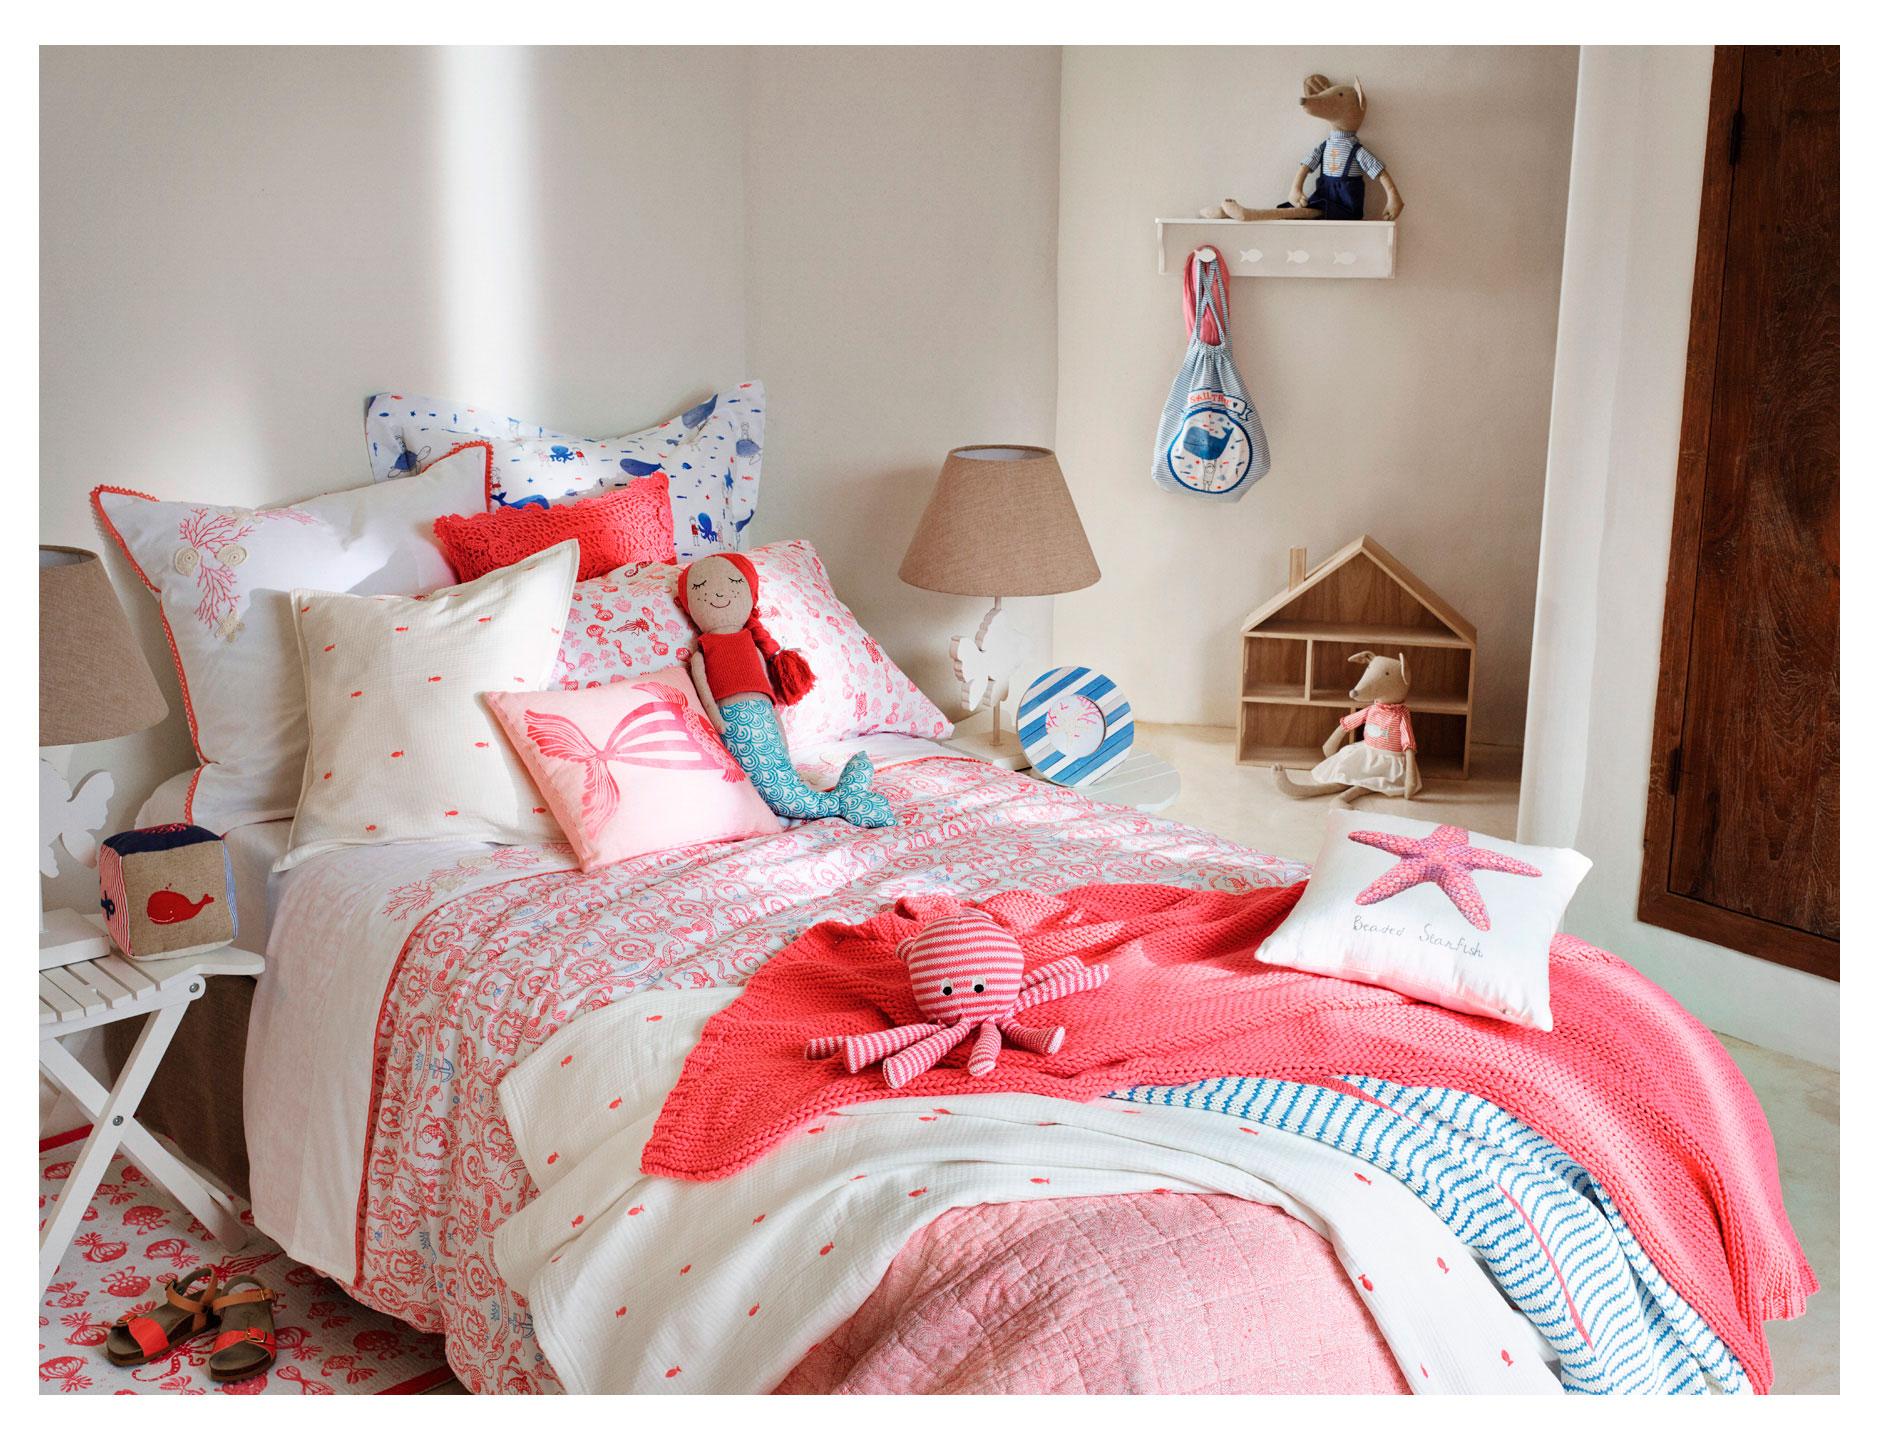 Zara home primavera verano 201540 for Zara home muebles catalogo